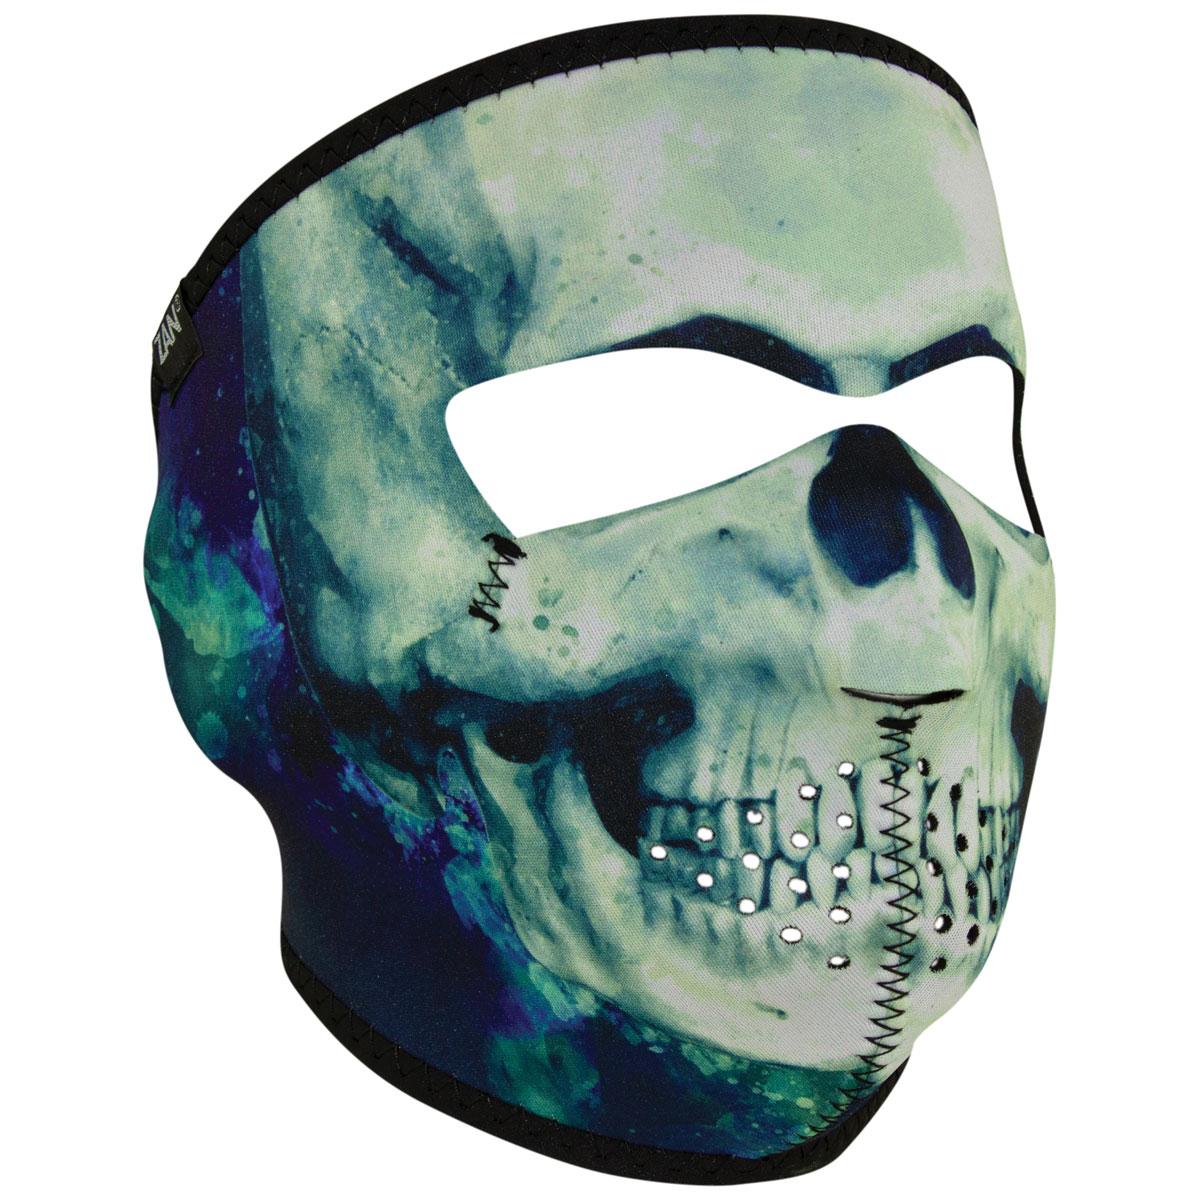 3e13d2317a8 ZAN headgear Neoprene Paint Skull Full Face Mask - WNFM414 ...